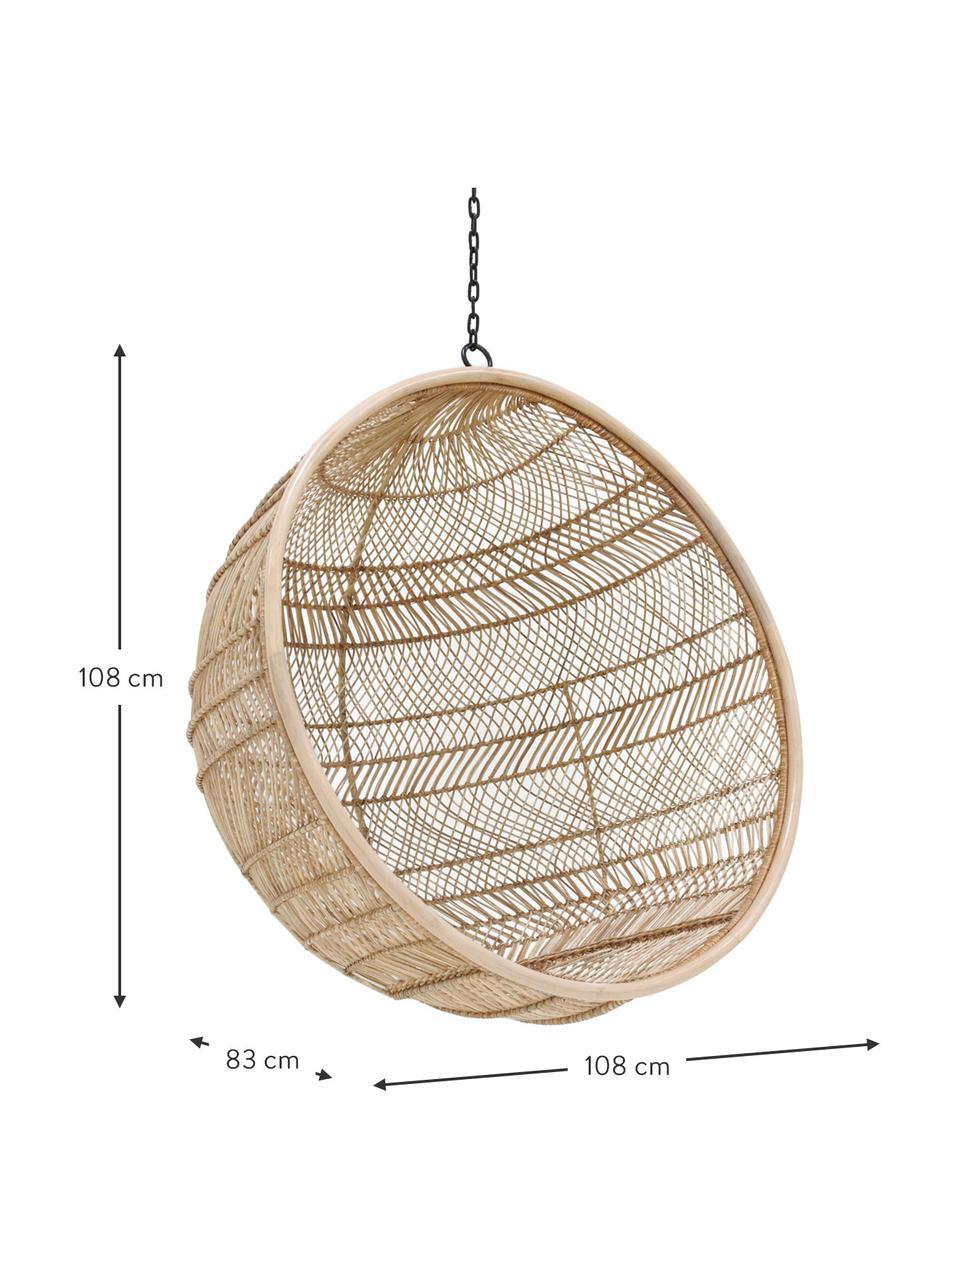 Poltrona sospesa in rattan Structure, Rattan, Ø 108 x Alt. 83 cm